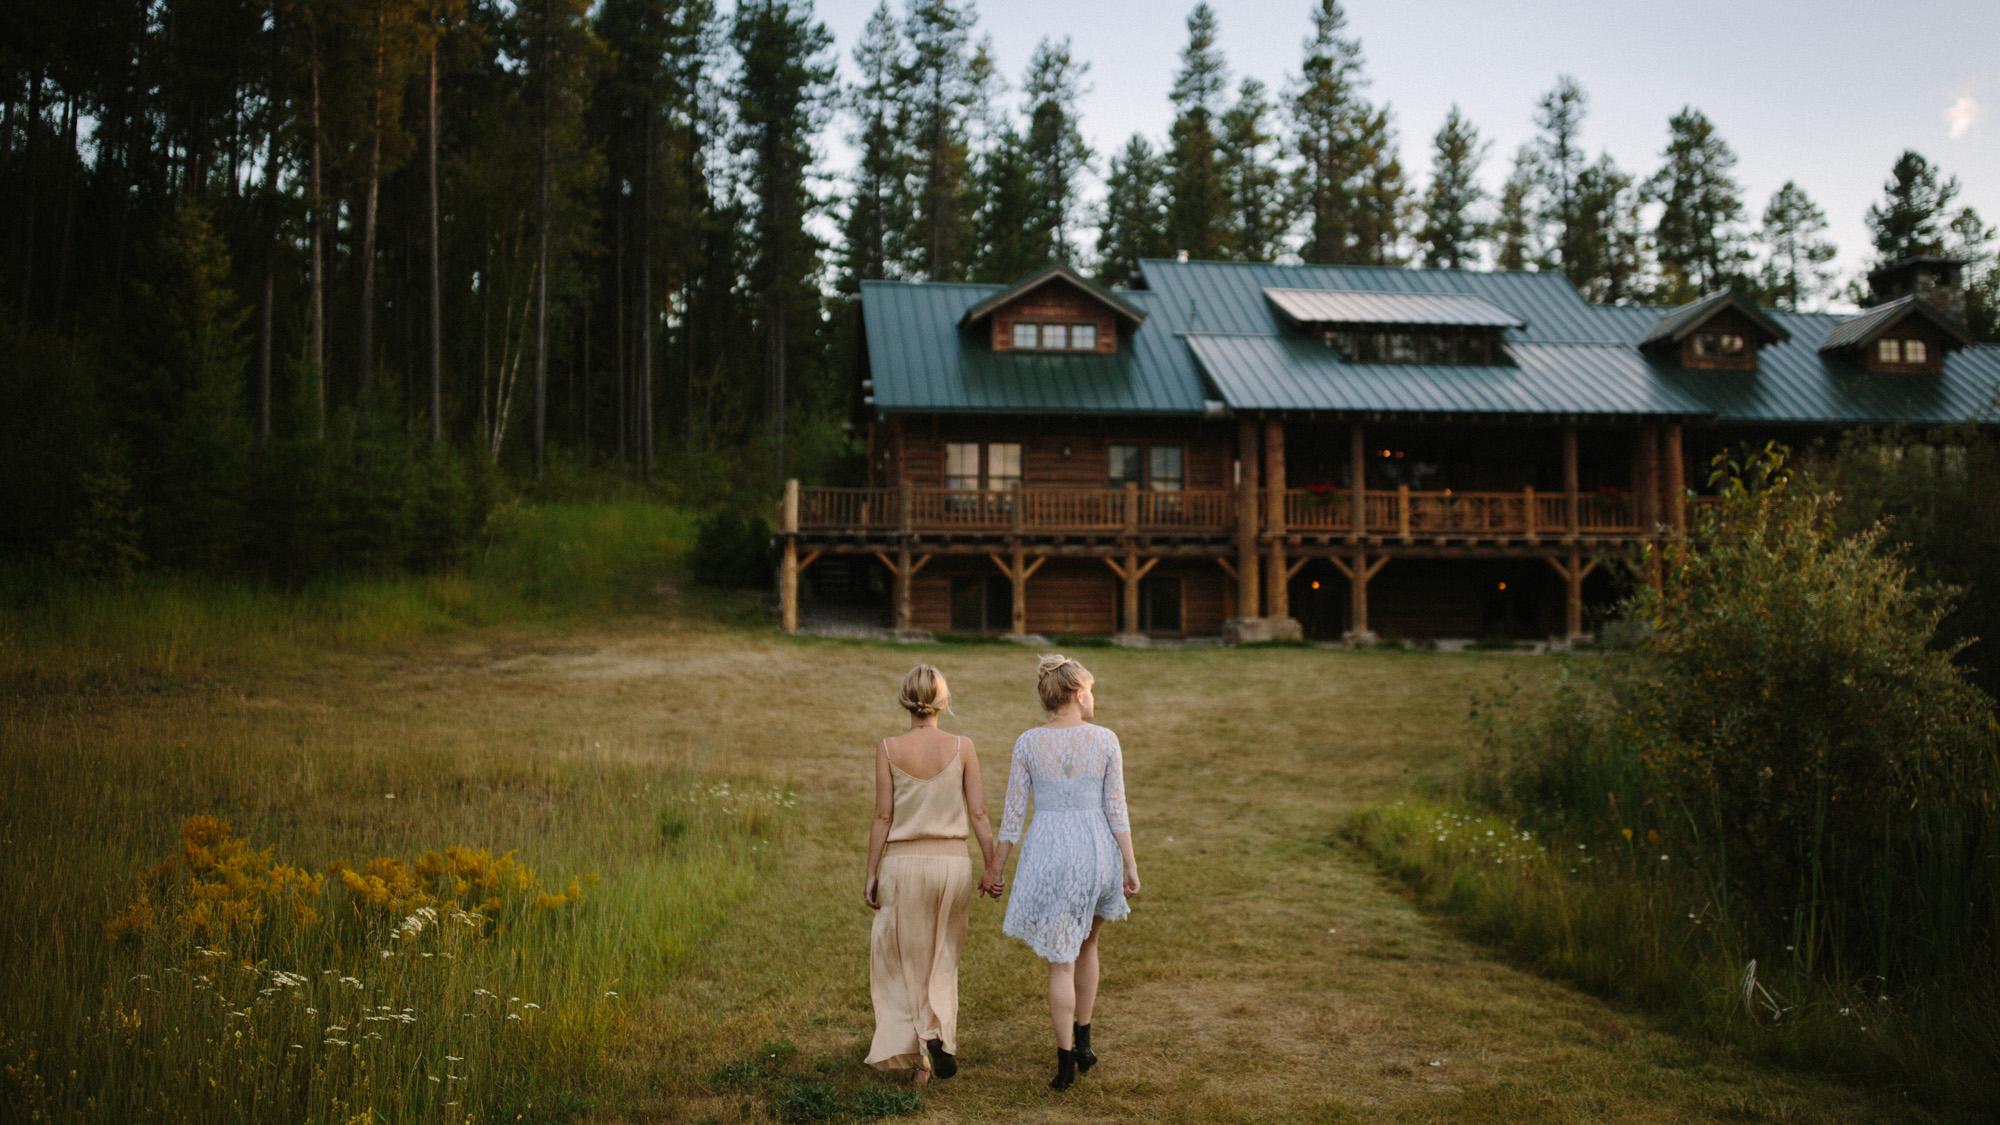 Montana_Wedding_Photos_alec_vanderboom-0031.jpg